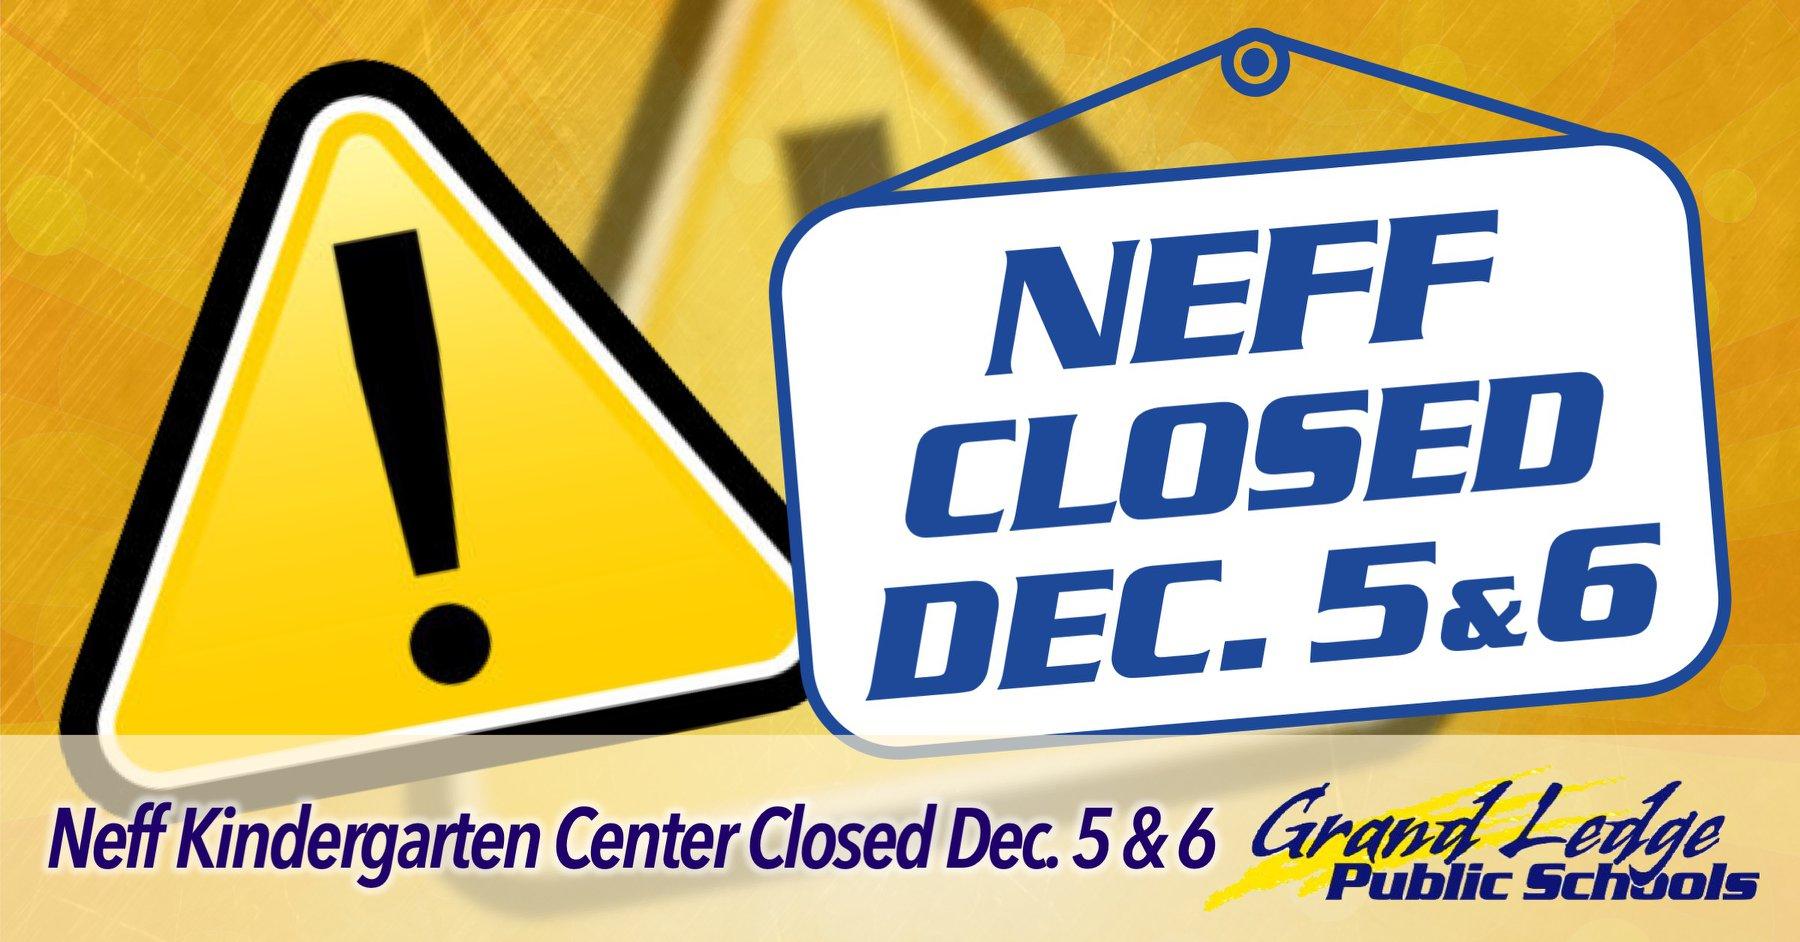 Neff Kindergarten School Closes Due To Illnesses And With Grand Ledge Public Schools Calendar